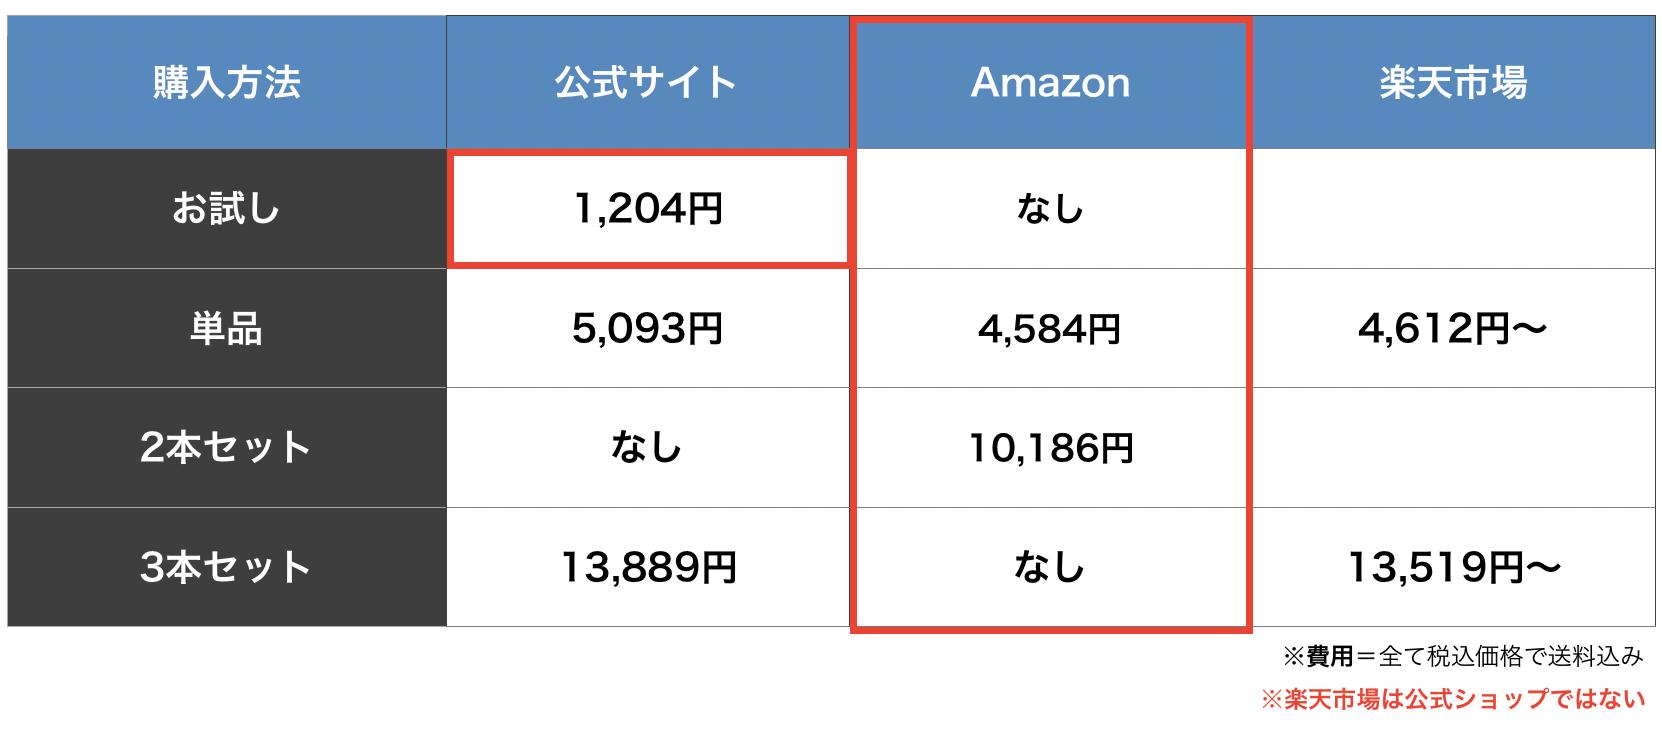 HG-101の購入方法を比較